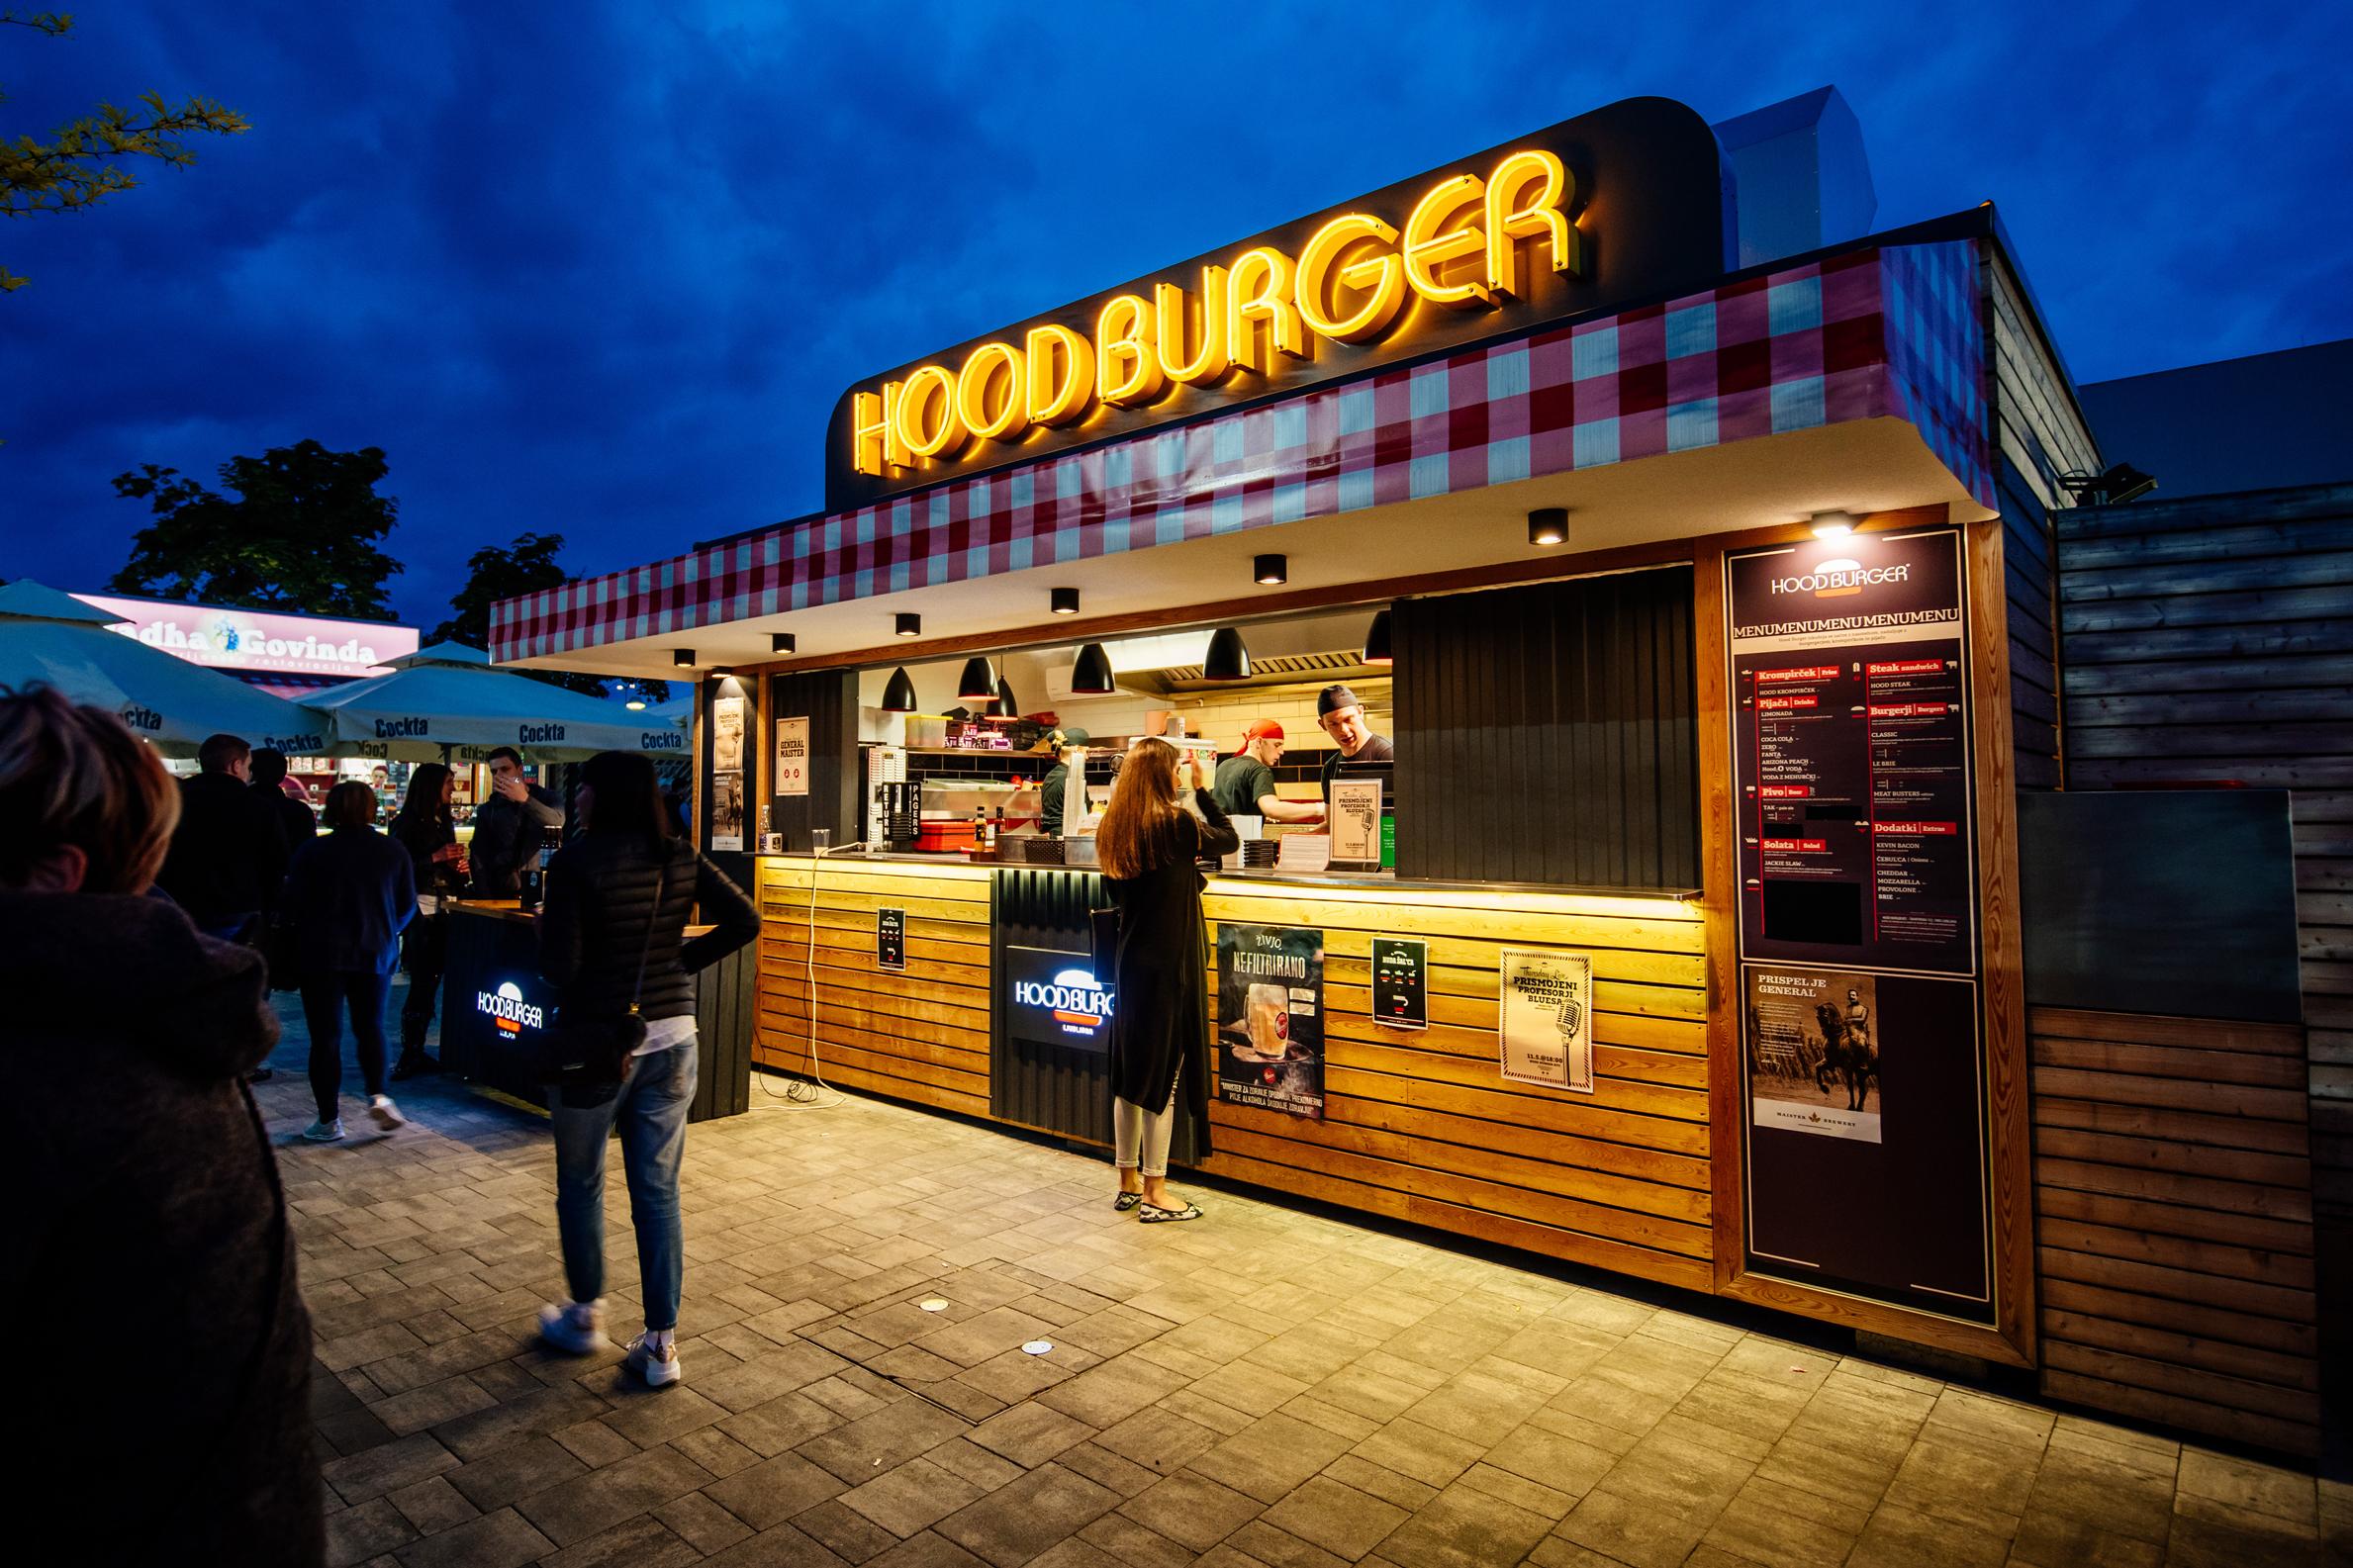 Hood Burger